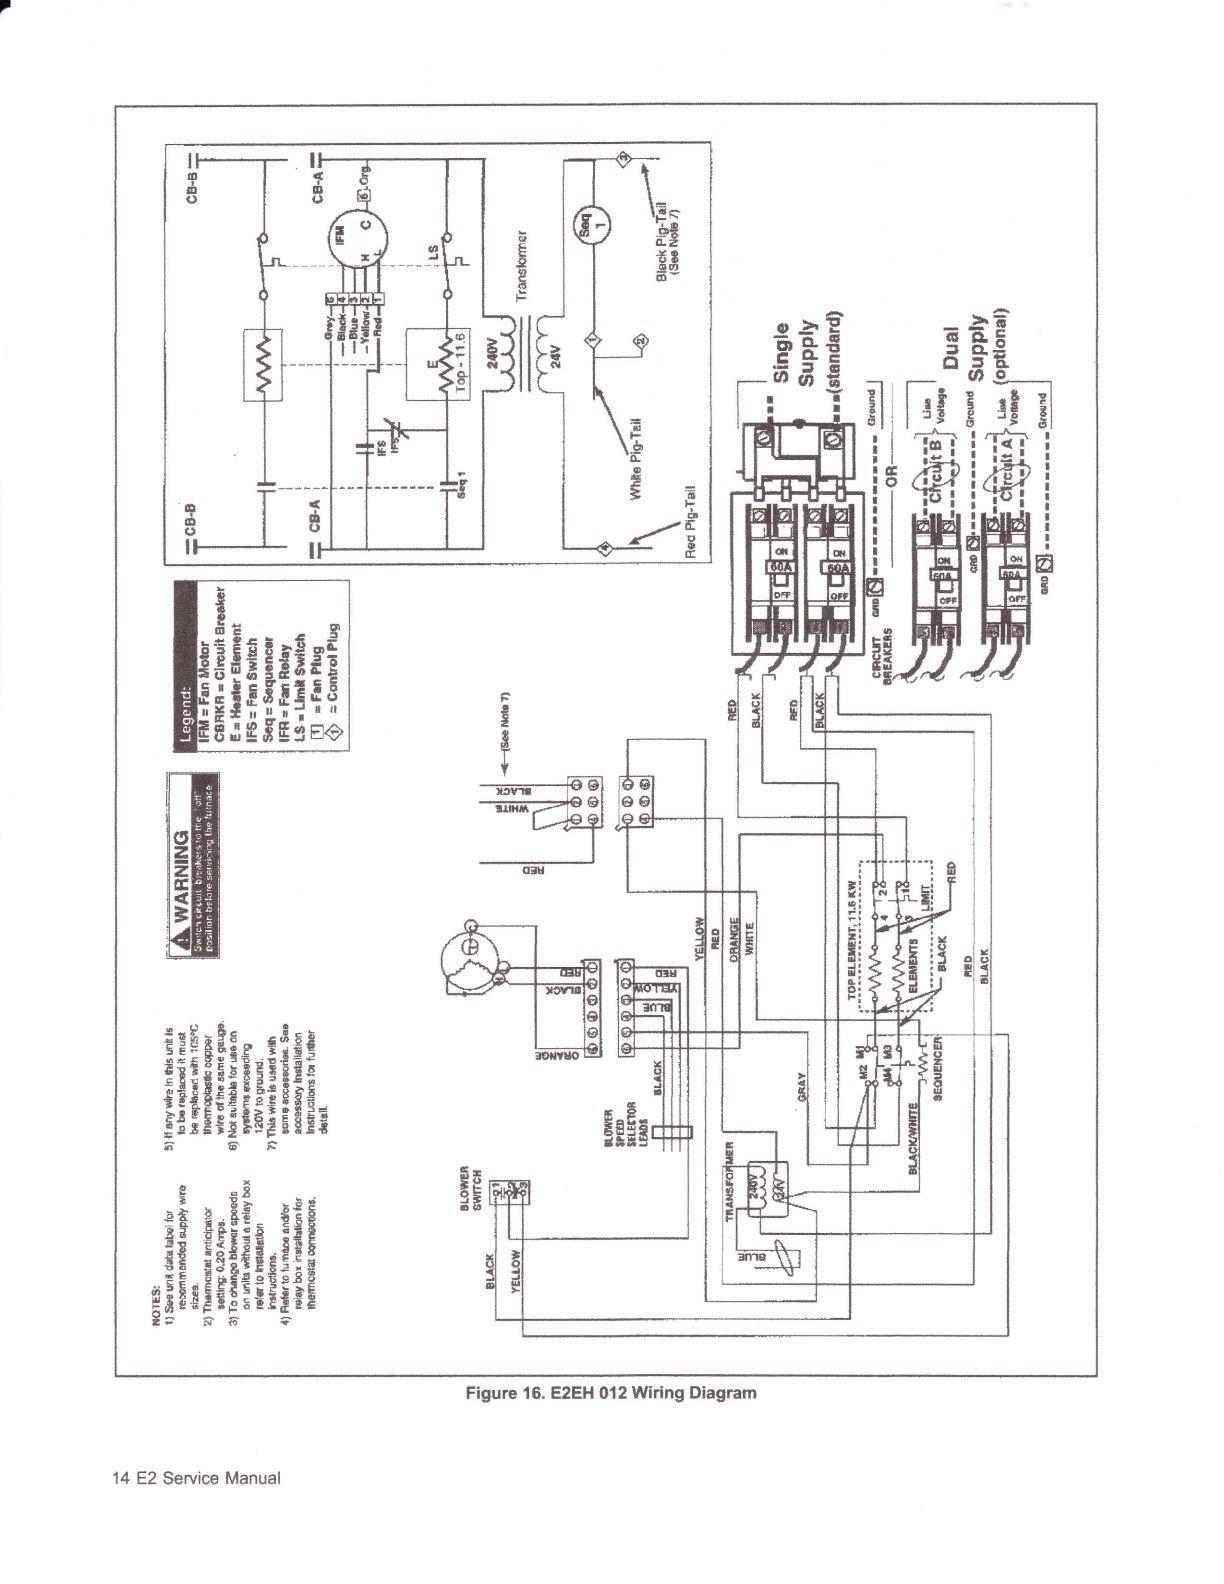 Heat Sequencer Wiring Diagram Lovely Goodman Electric Furnace 12 1 - Heat Sequencer Wiring Diagram